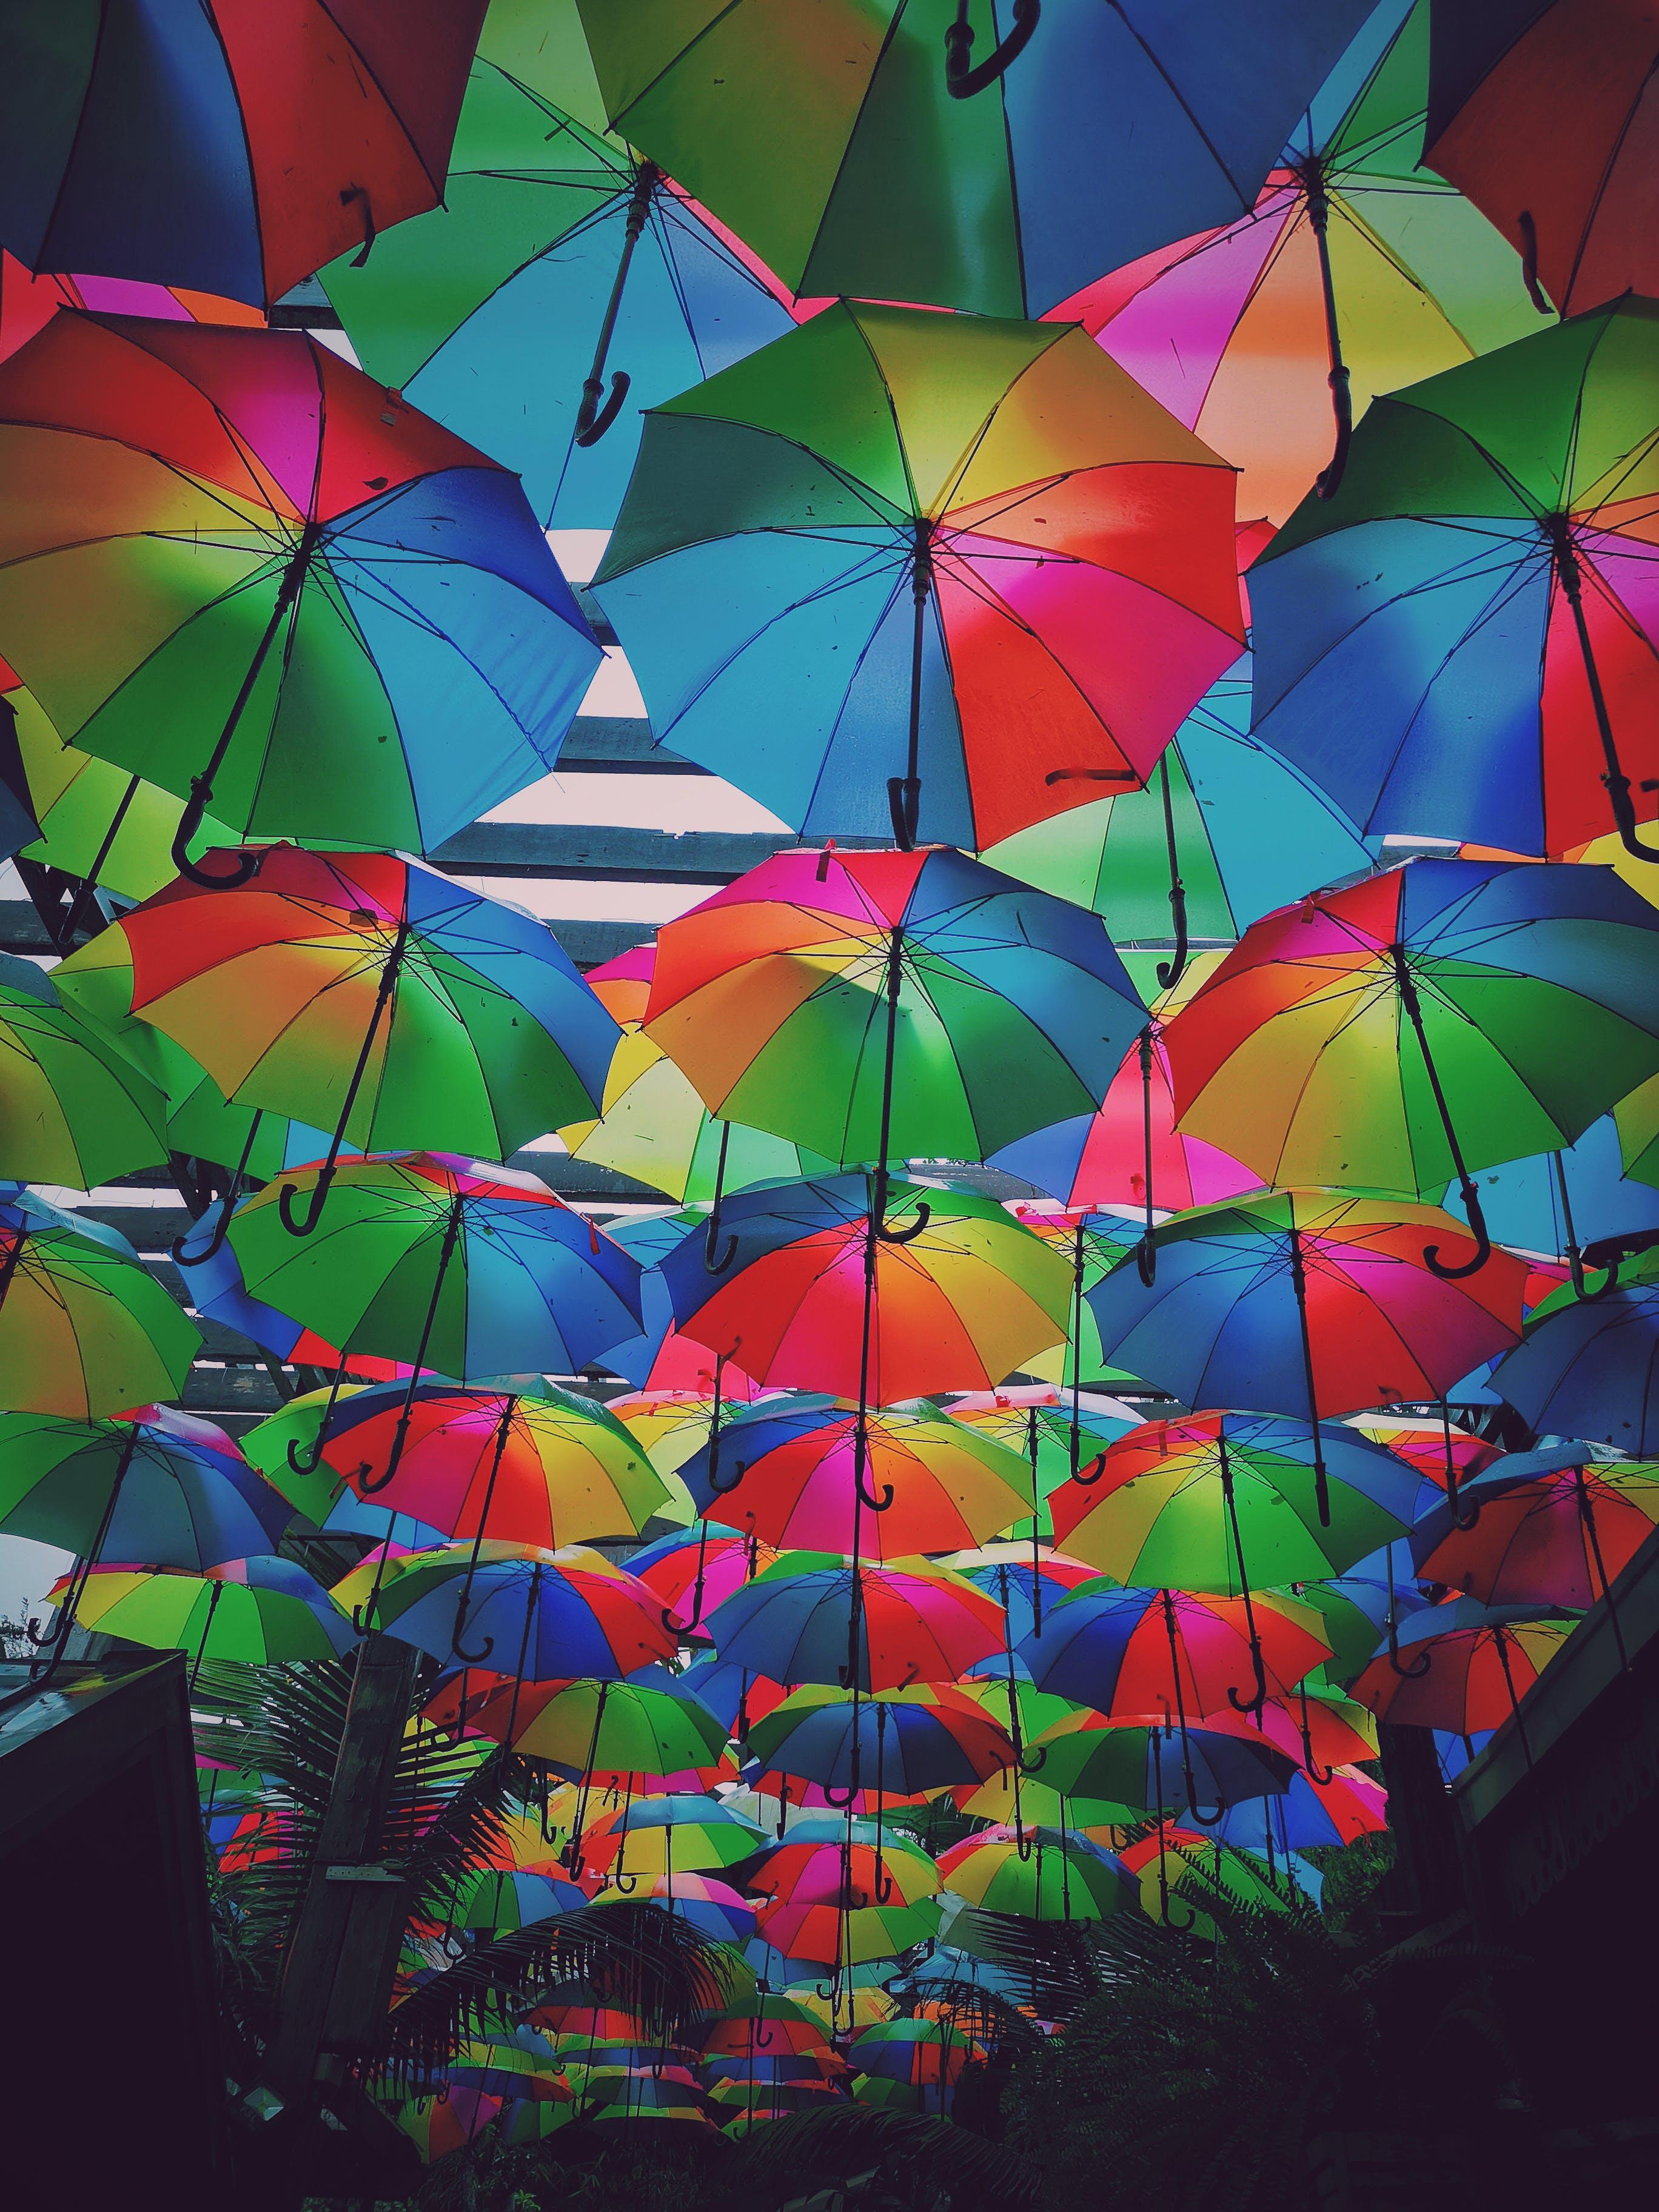 Free stock photo of rain drops, umbrellas